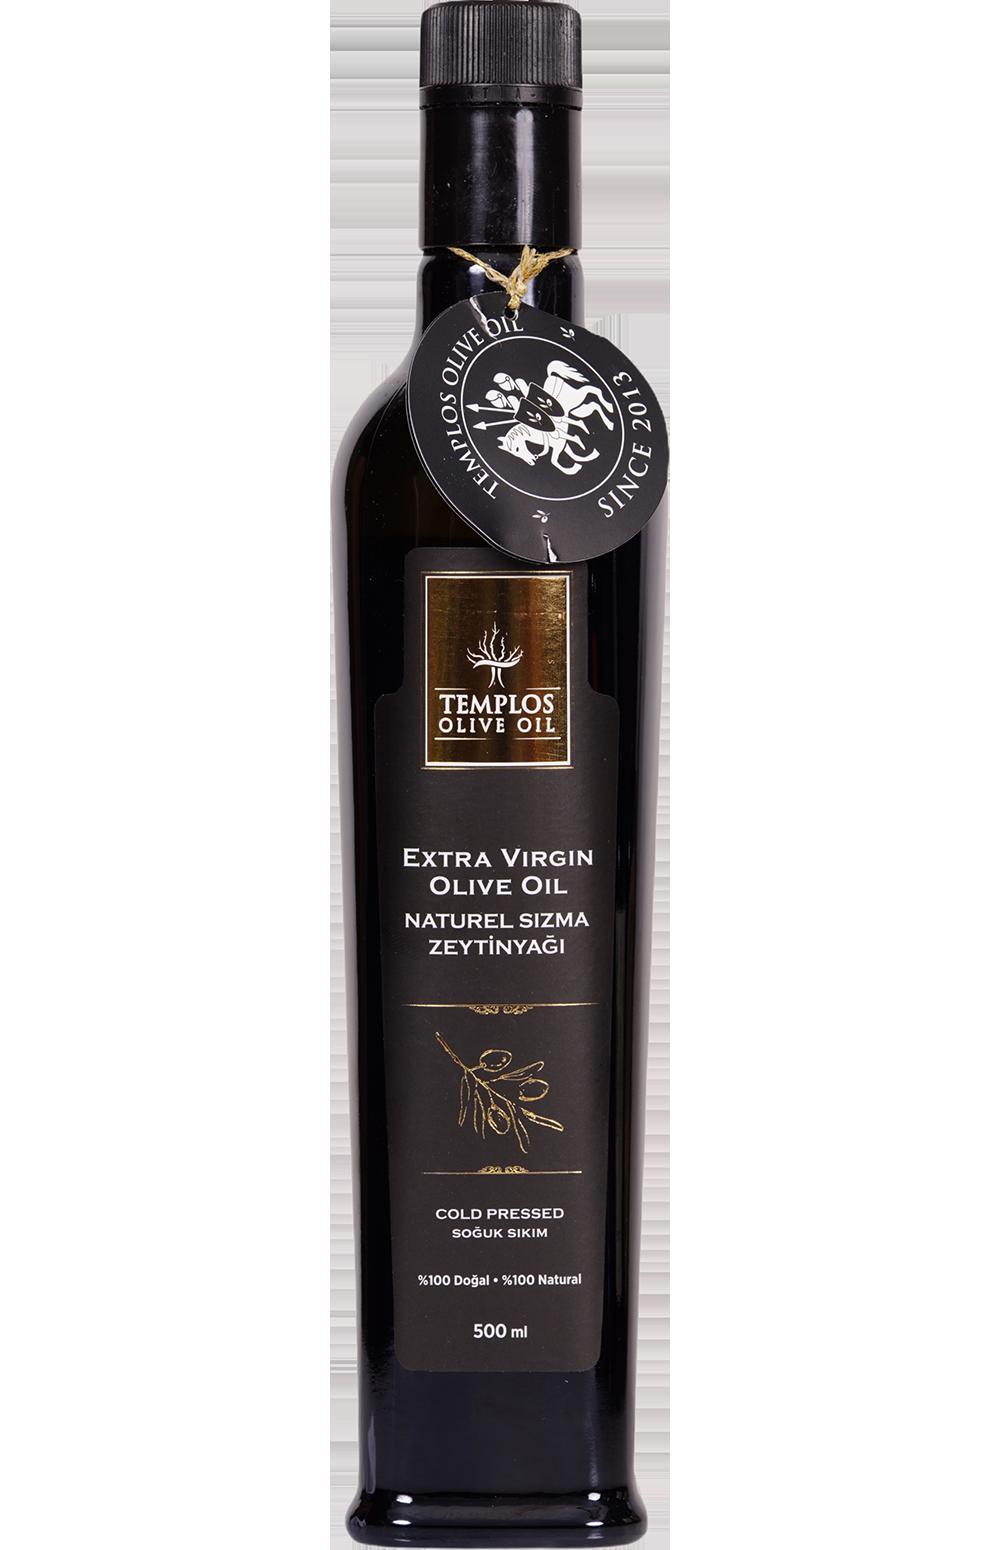 Templos Olive Oil